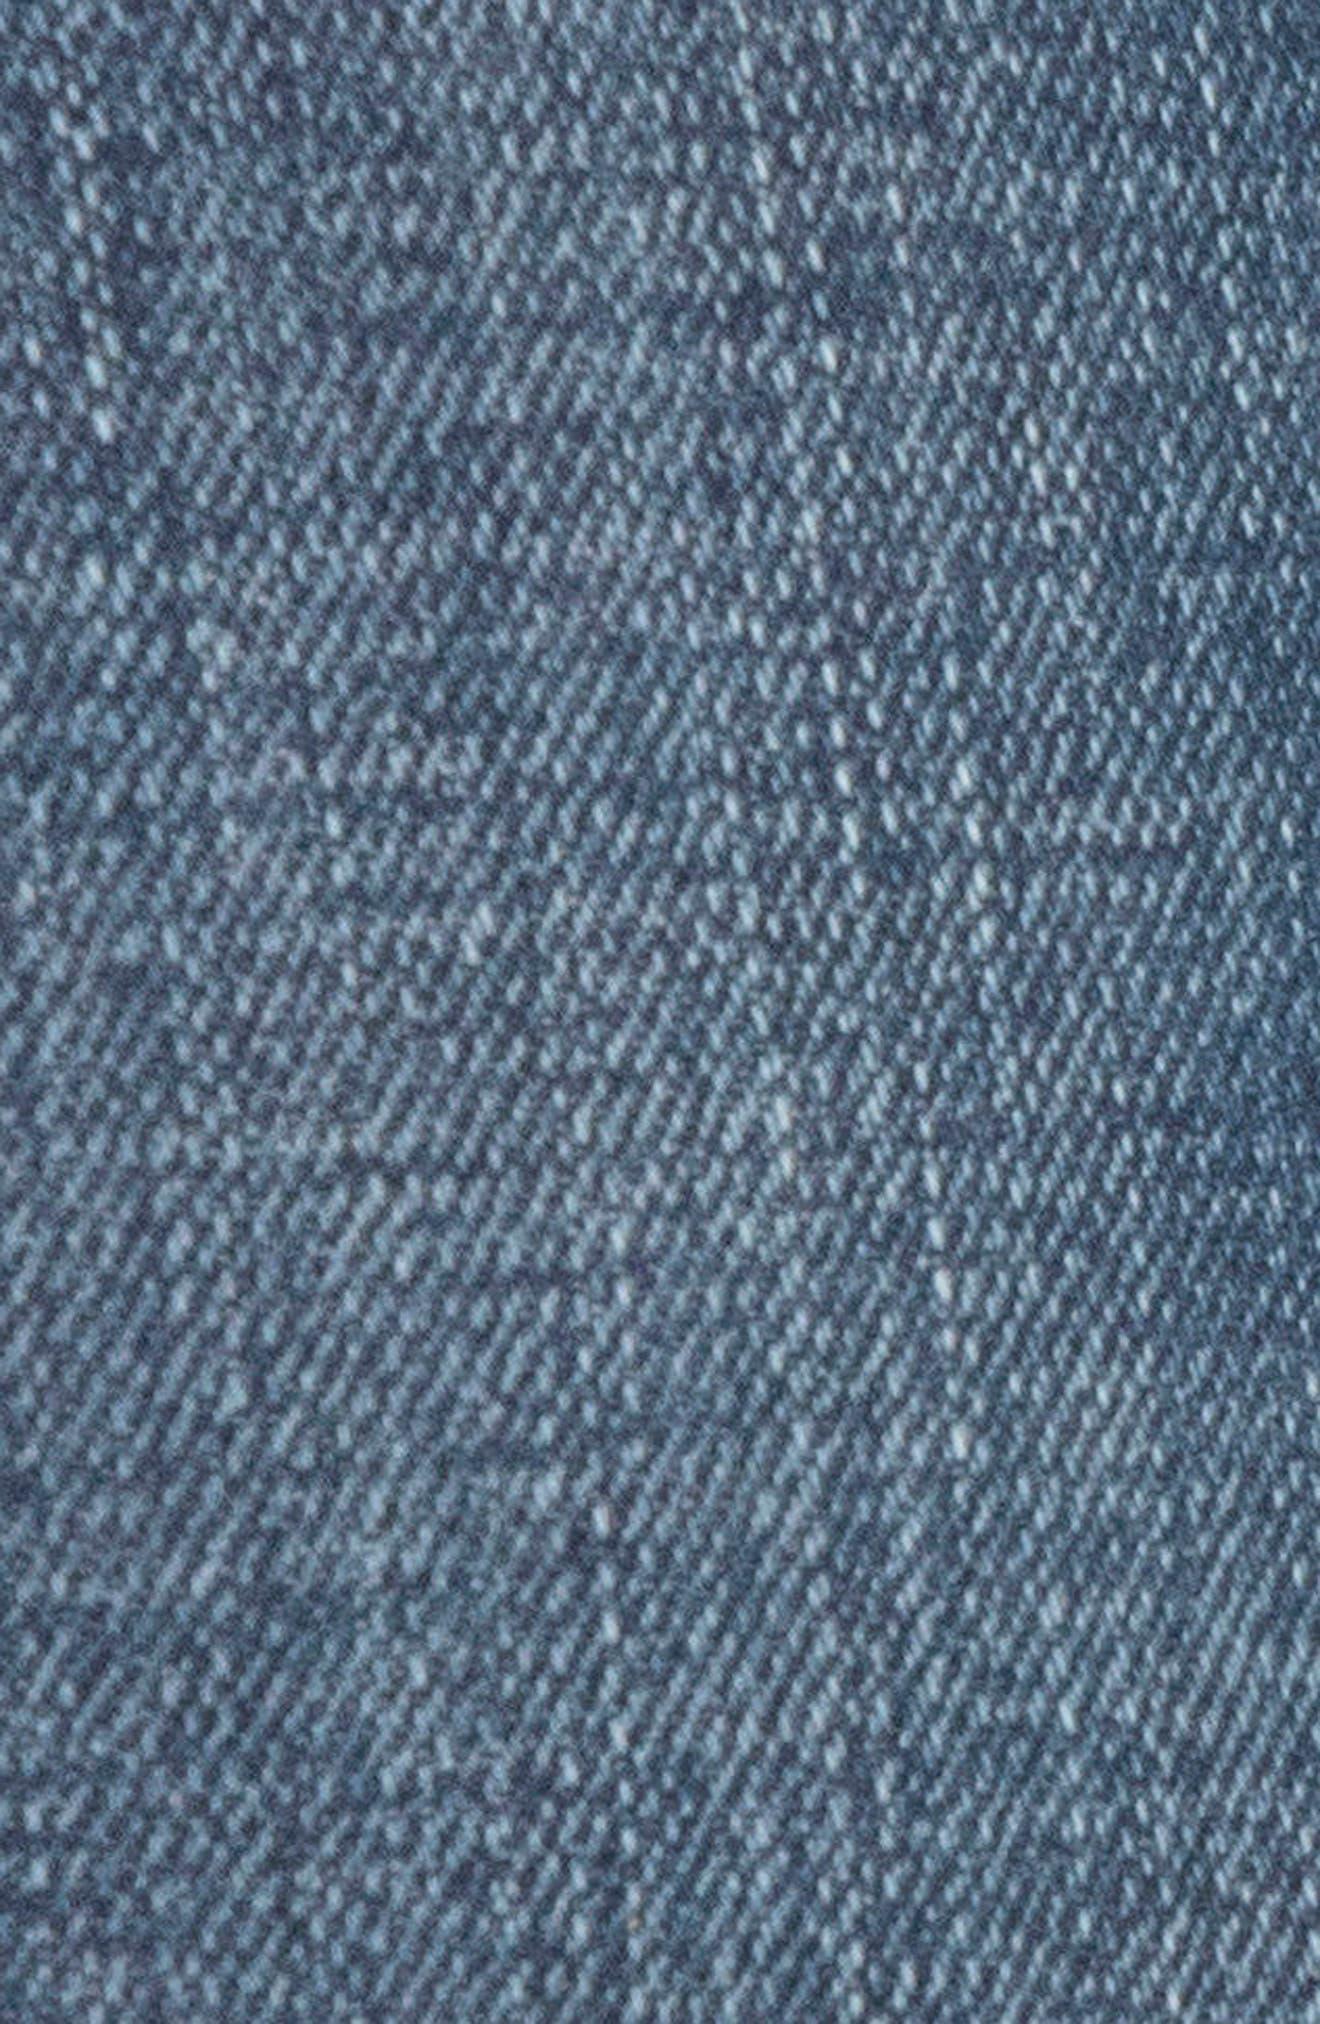 El Camino - Patch It Boyfriend Jeans,                             Alternate thumbnail 6, color,                             INDIGO